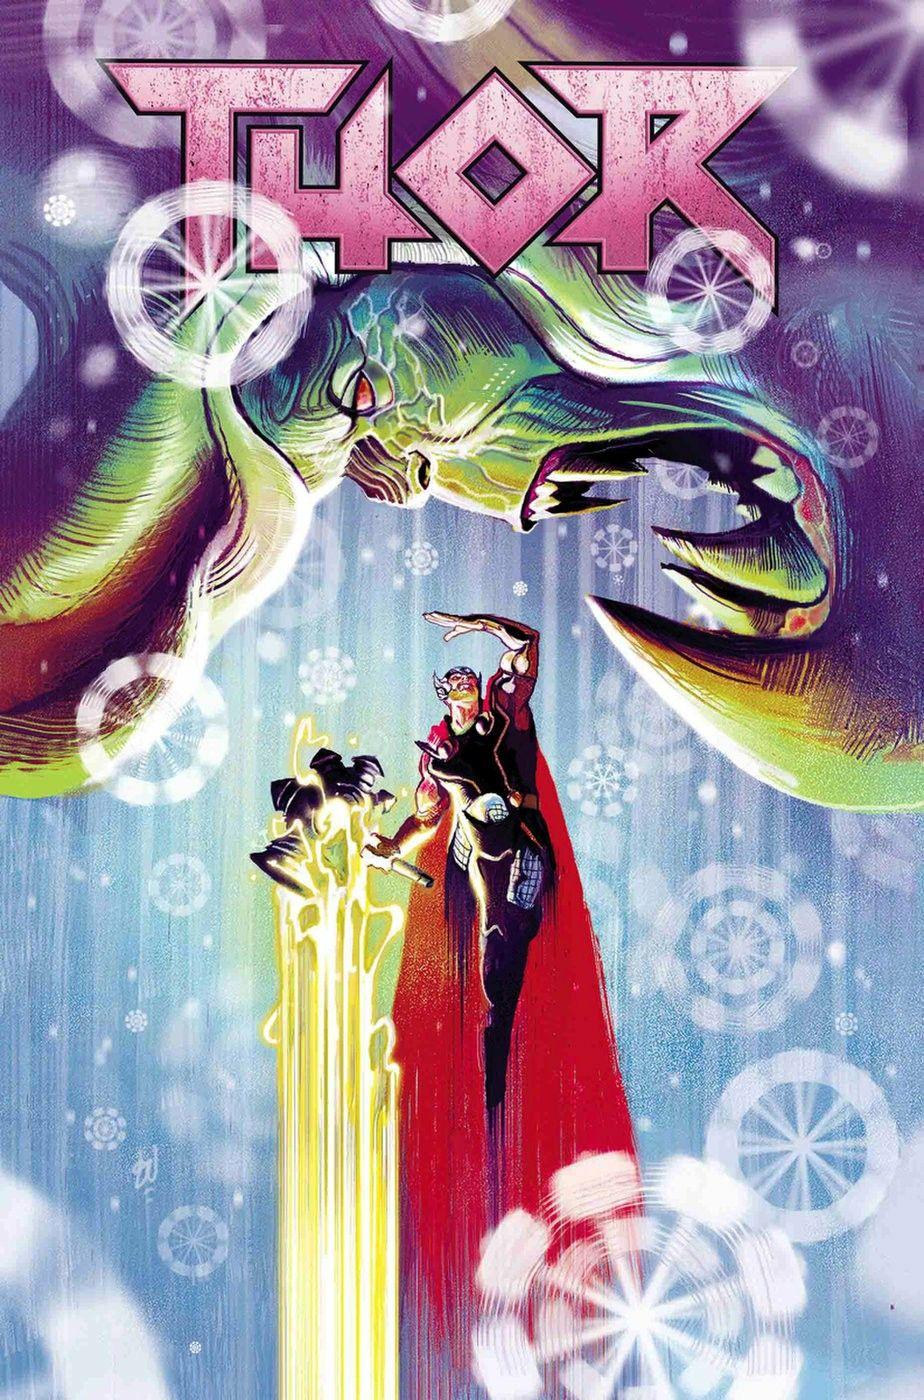 Best Comic Books 2020 Pin by Ardis Jackson on Marvel Knights legendary 2020 | Marvel